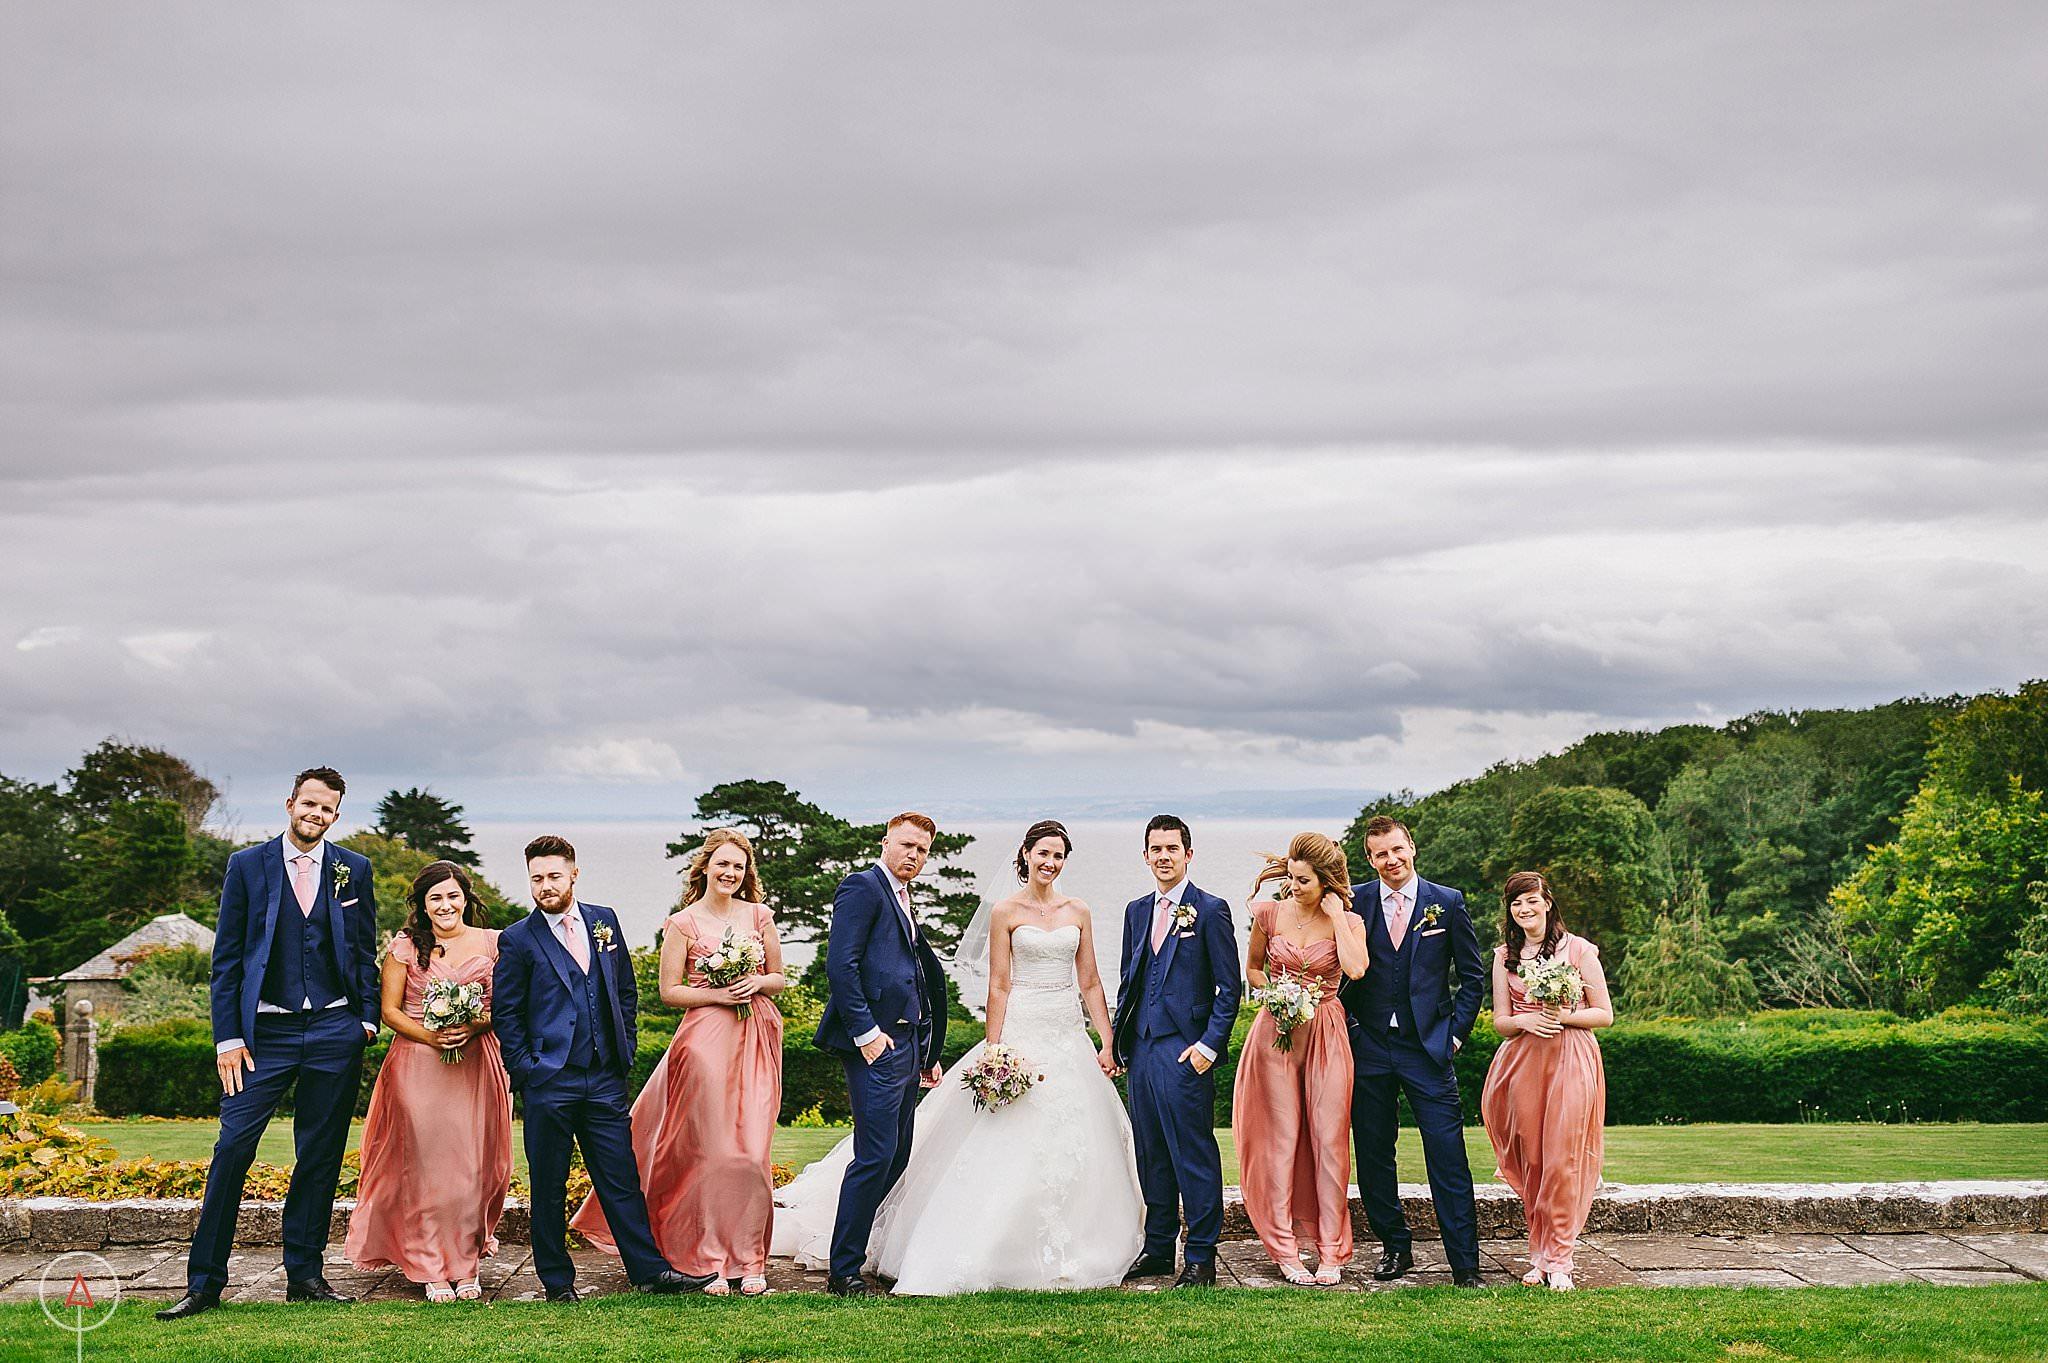 st-donats-llantwit-major-wedding-photography_0070